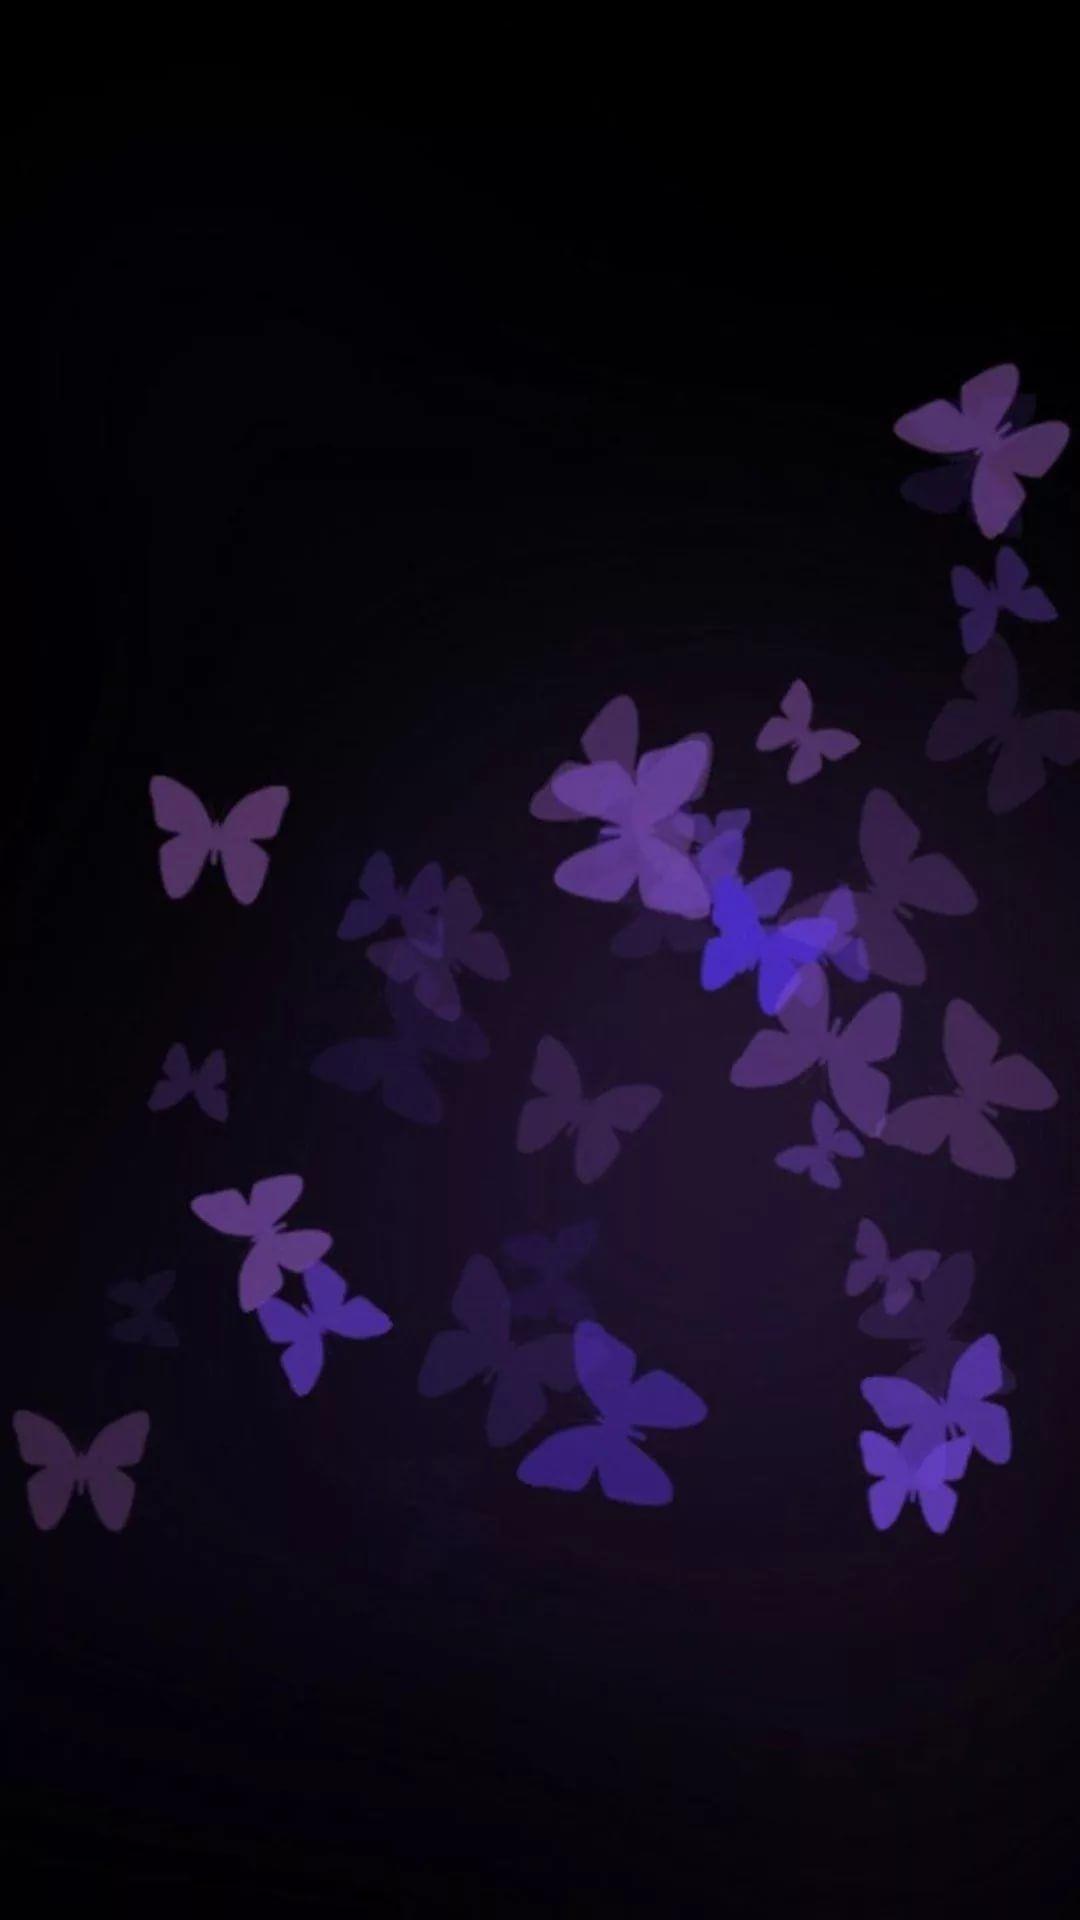 Purple iPhone 7 wallpaper